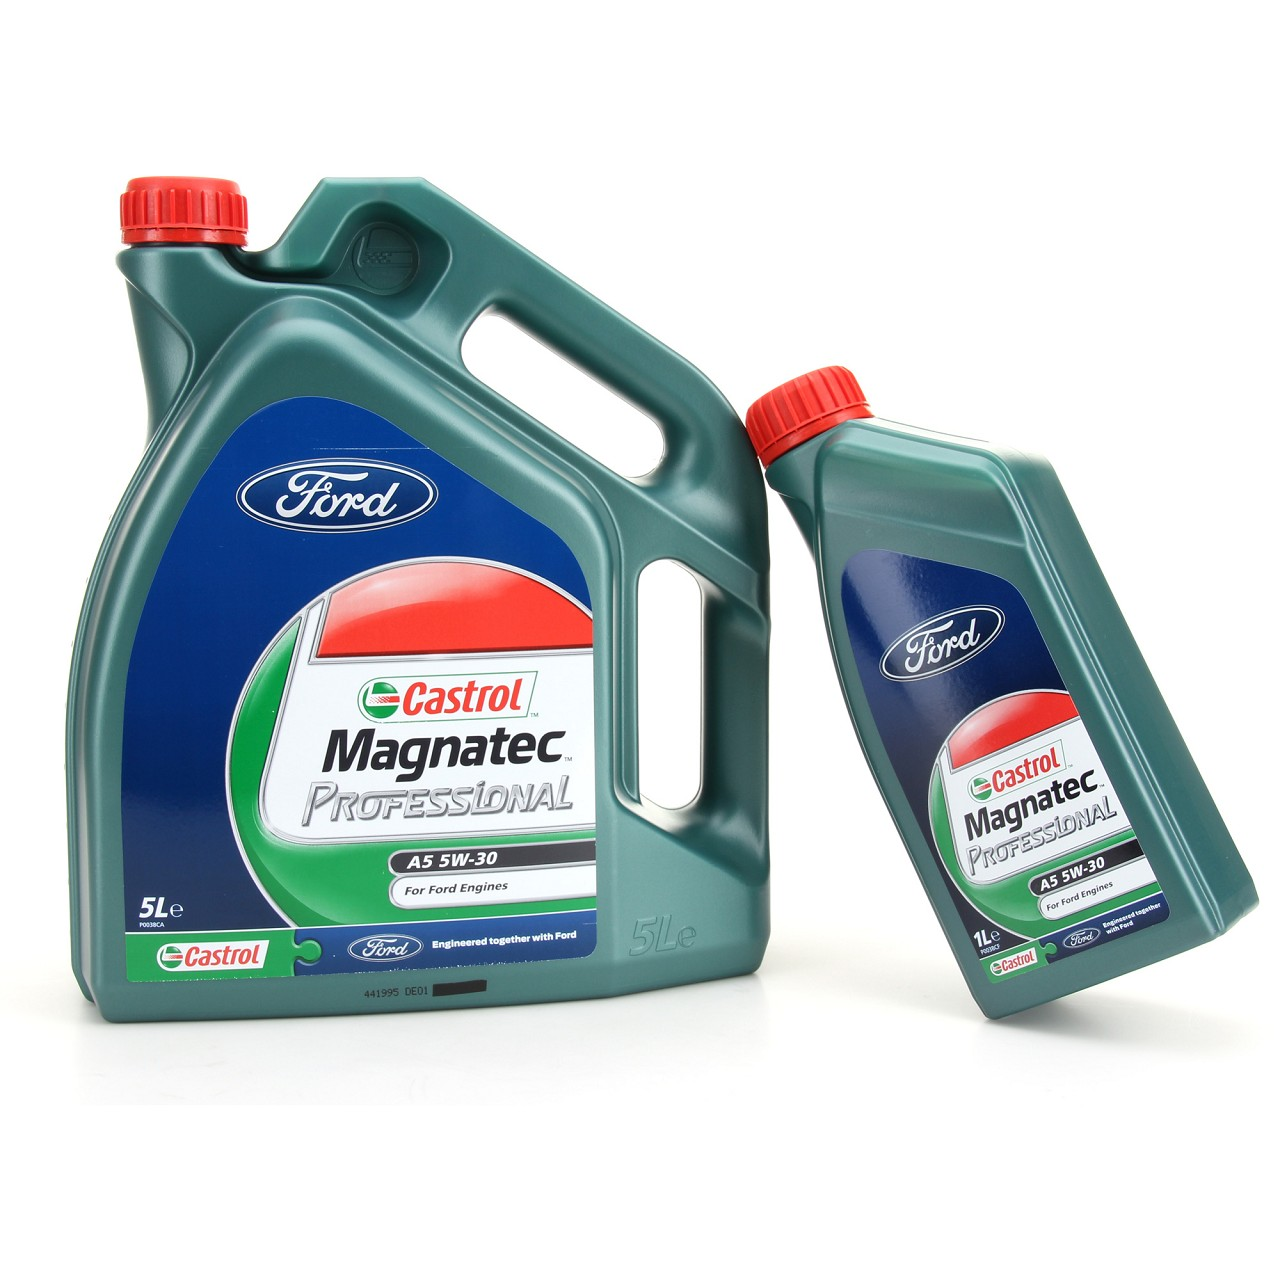 ORIGINAL Ford Motoröl Öl CASTROL Magnatec Professional A5 5W30 - 6L 6 Liter